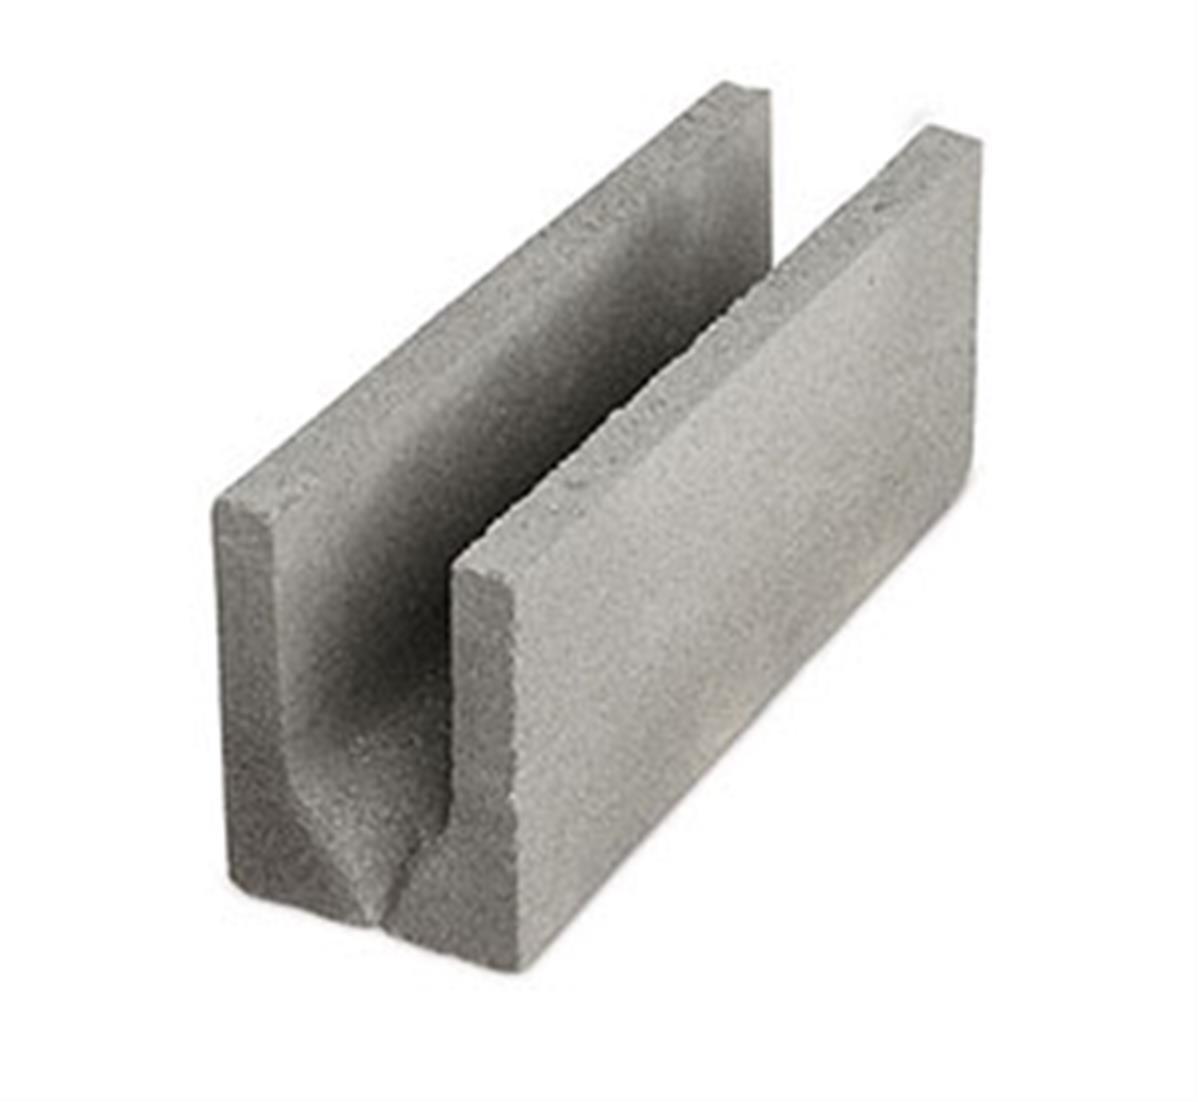 Bloc Beton Linteau B40 200x200x500 Parpaing Chainage Horizontal